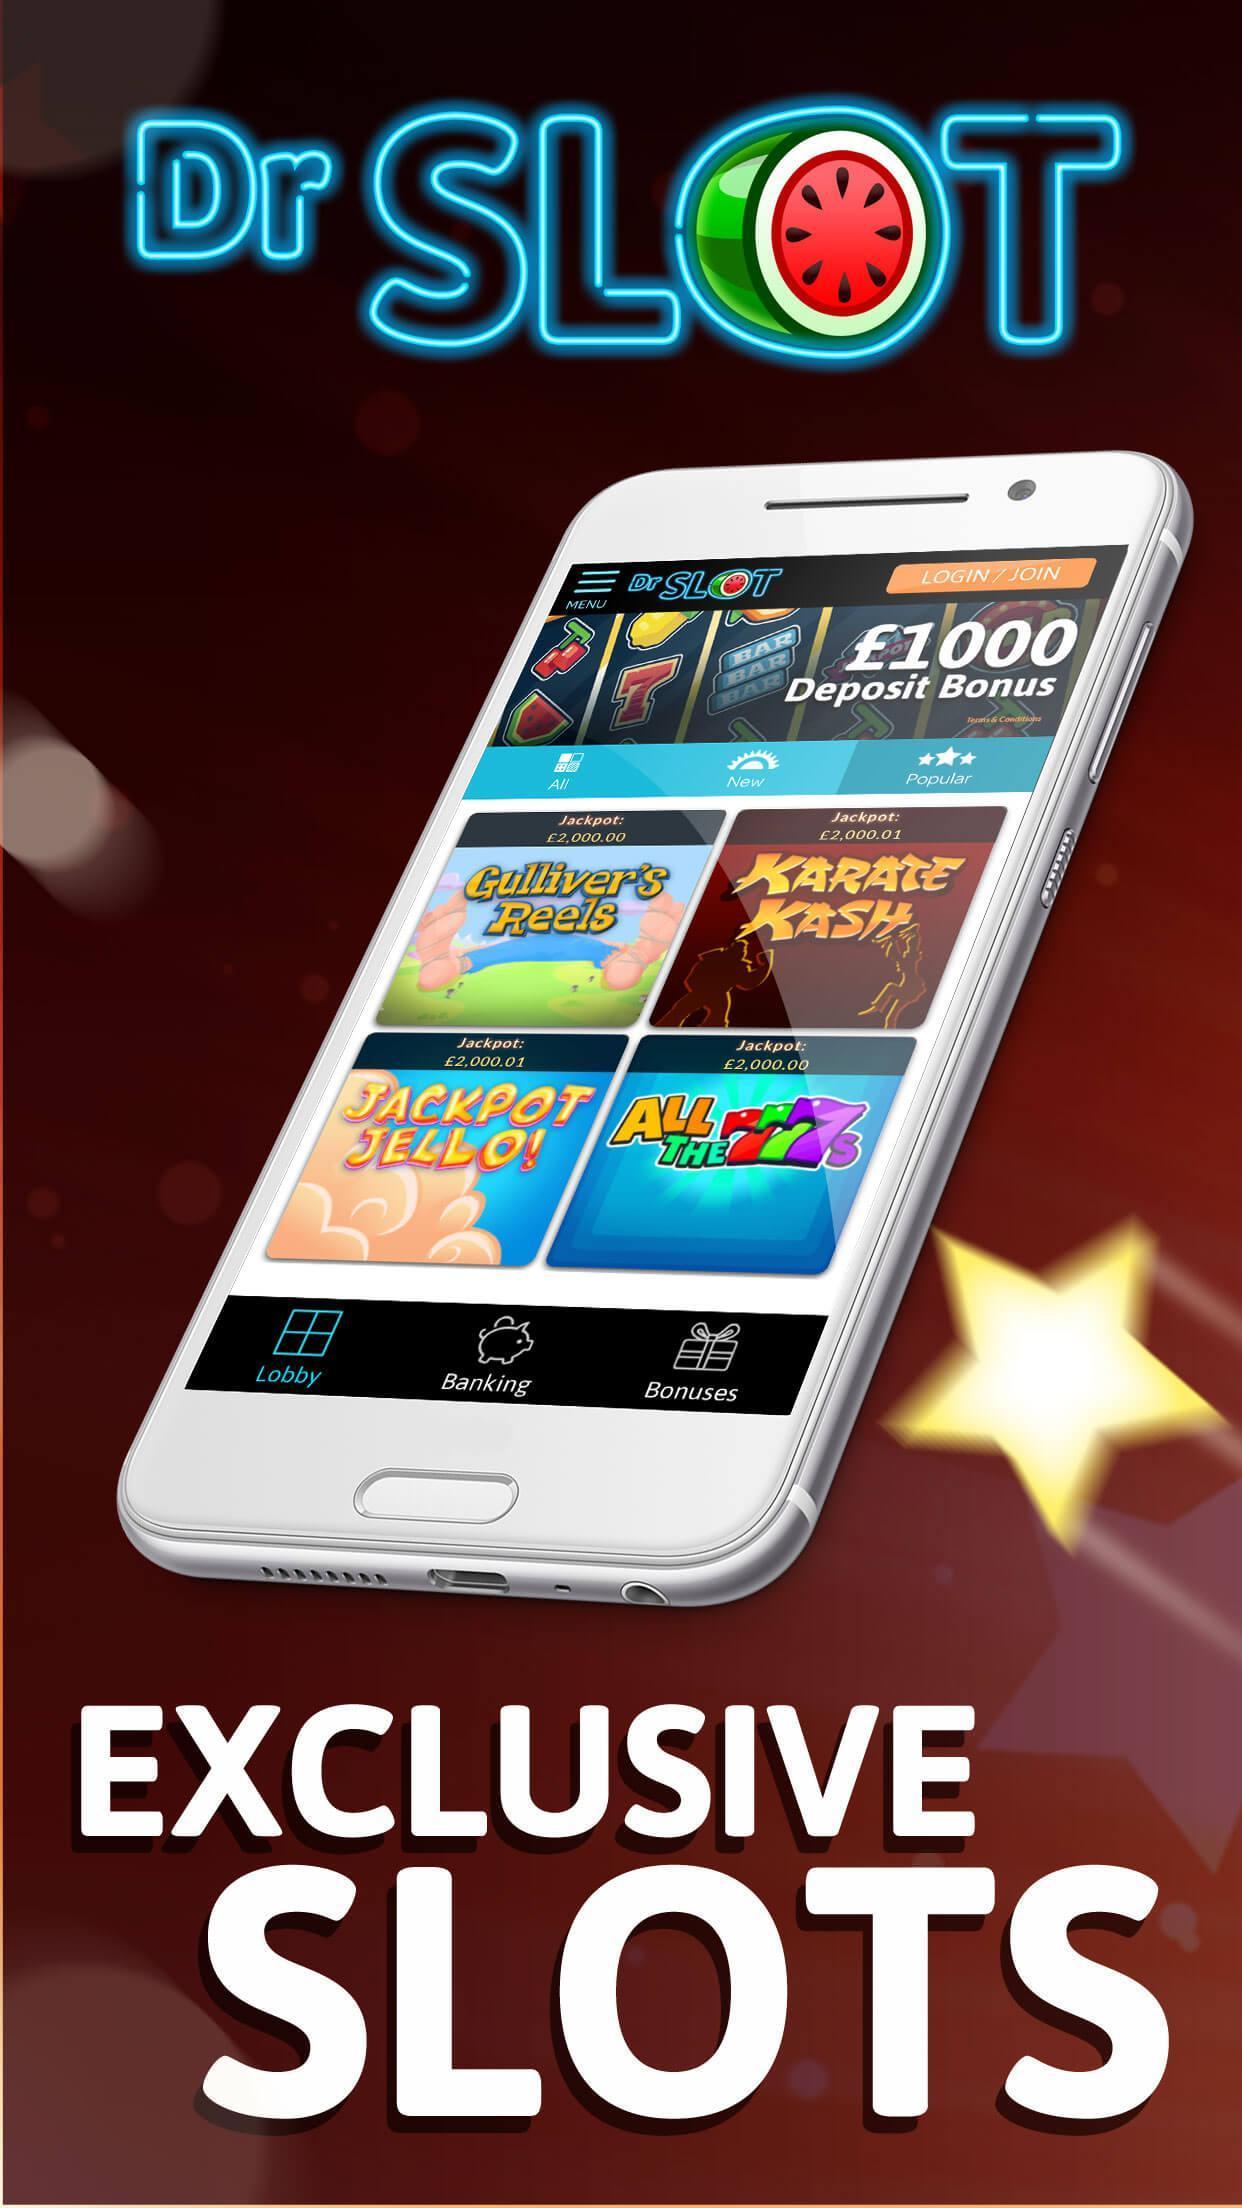 Cabaret club casino free spins